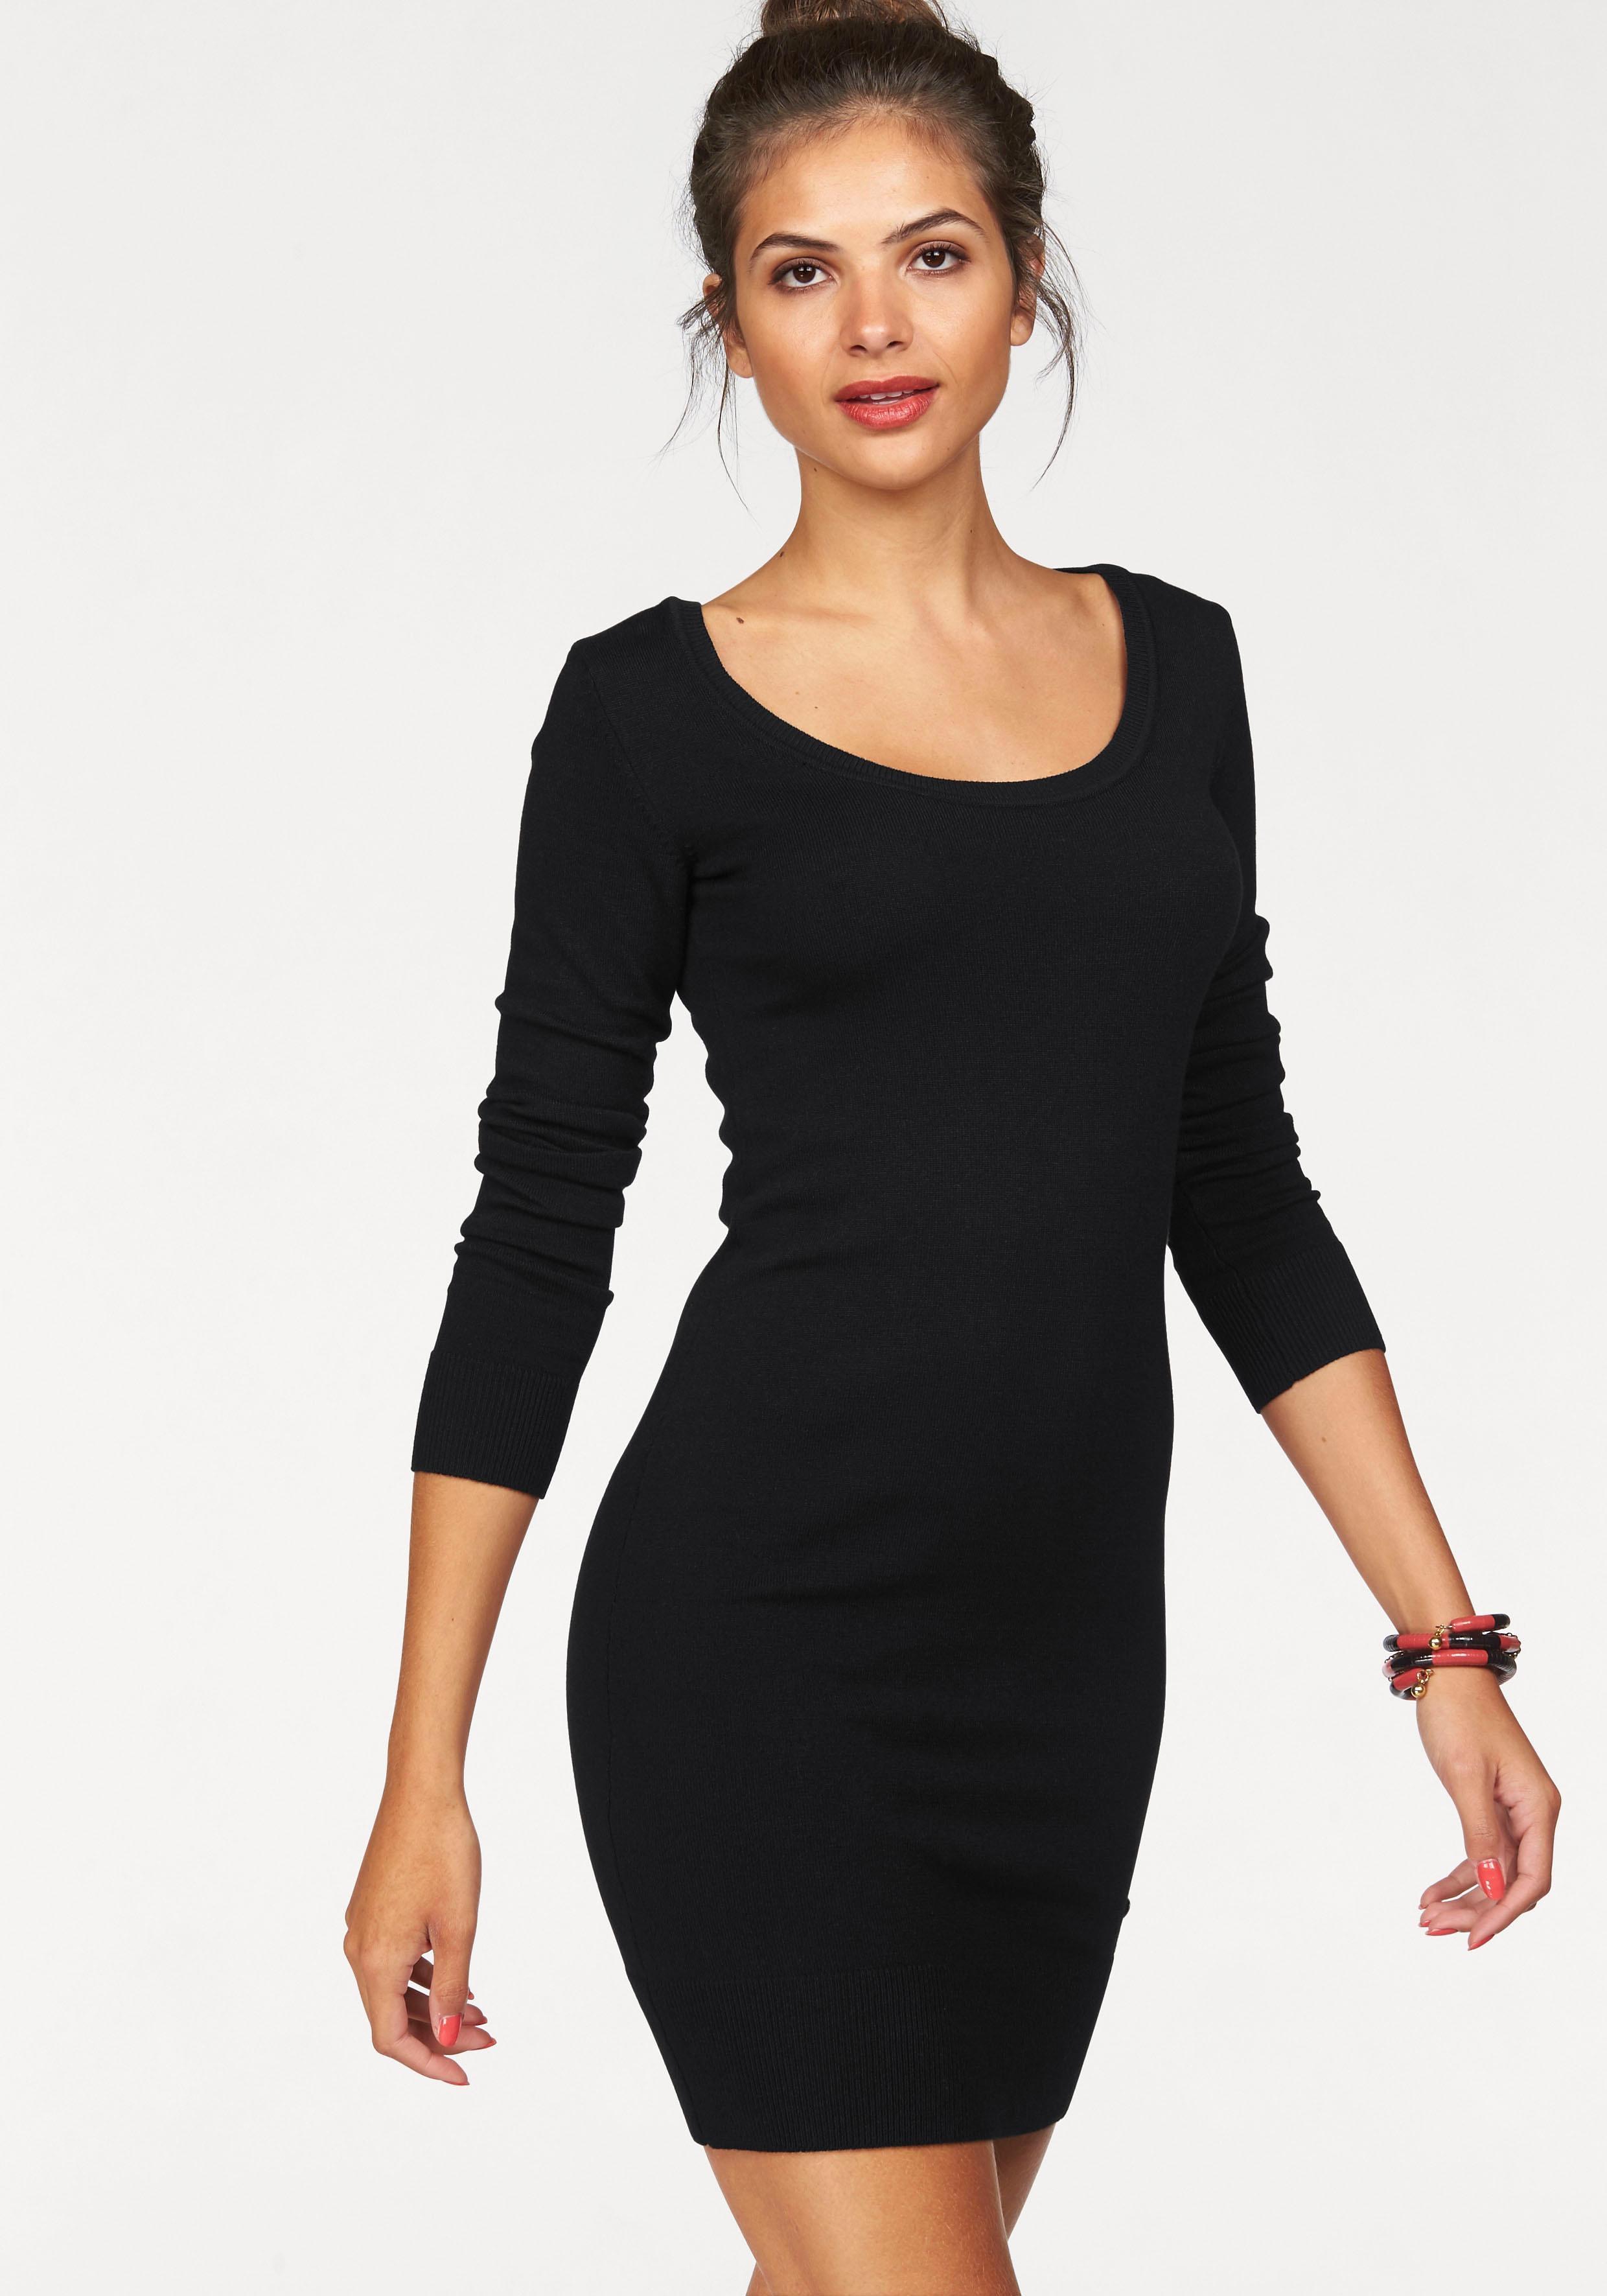 zwarte jurken online kopen 20 korting op alle jurken otto. Black Bedroom Furniture Sets. Home Design Ideas